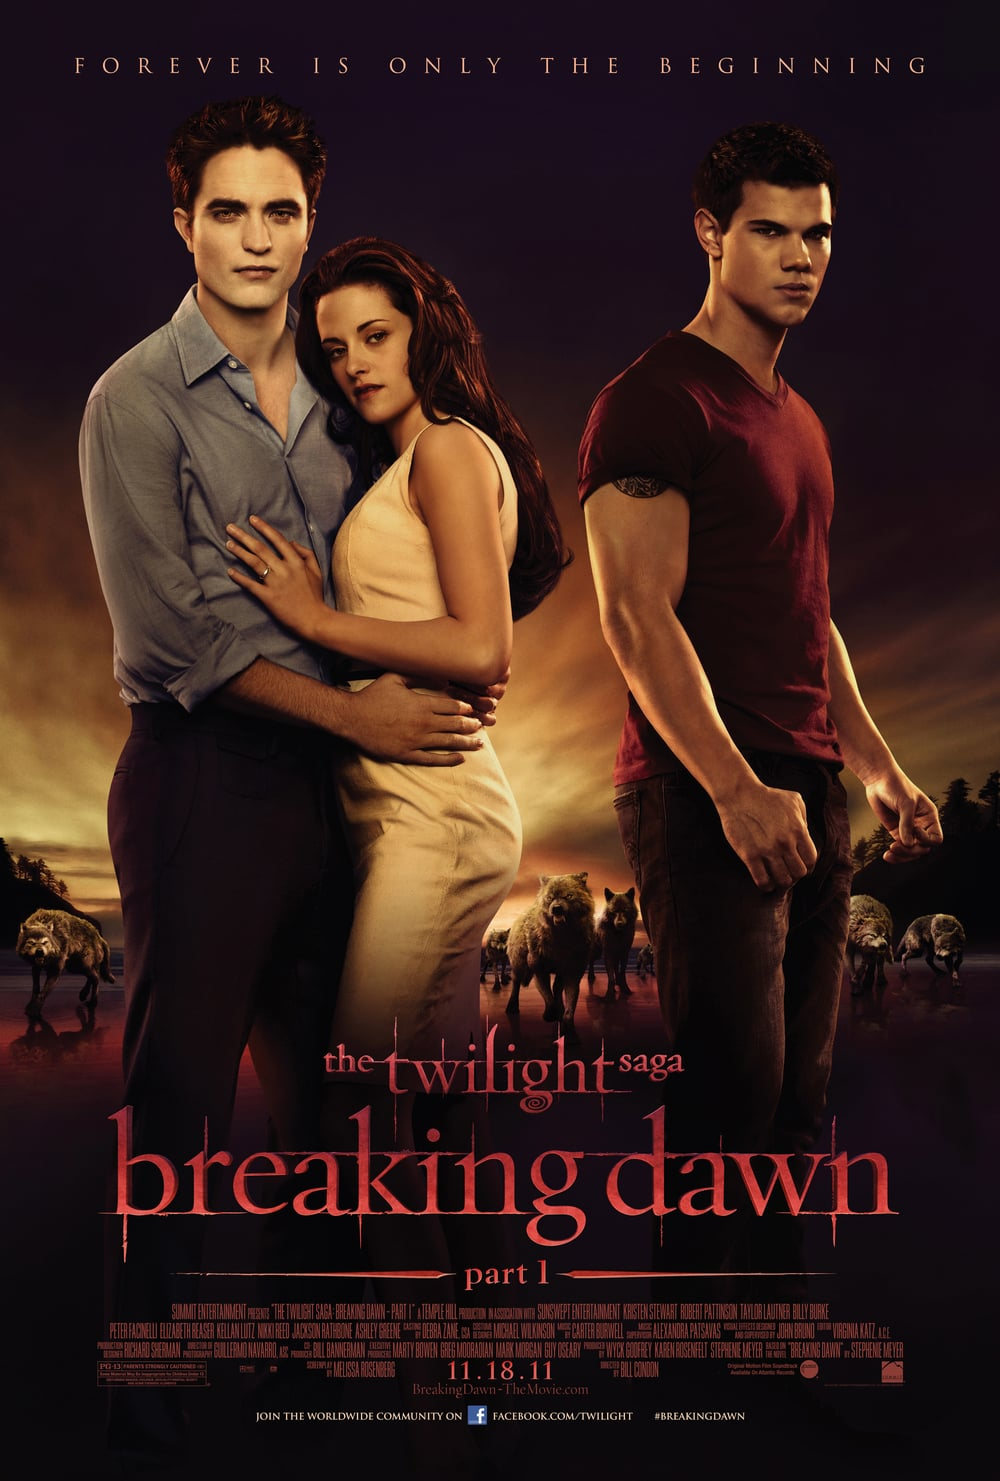 twilight-saga-breaking-dawn-part-1-movie-poster-final.jpg